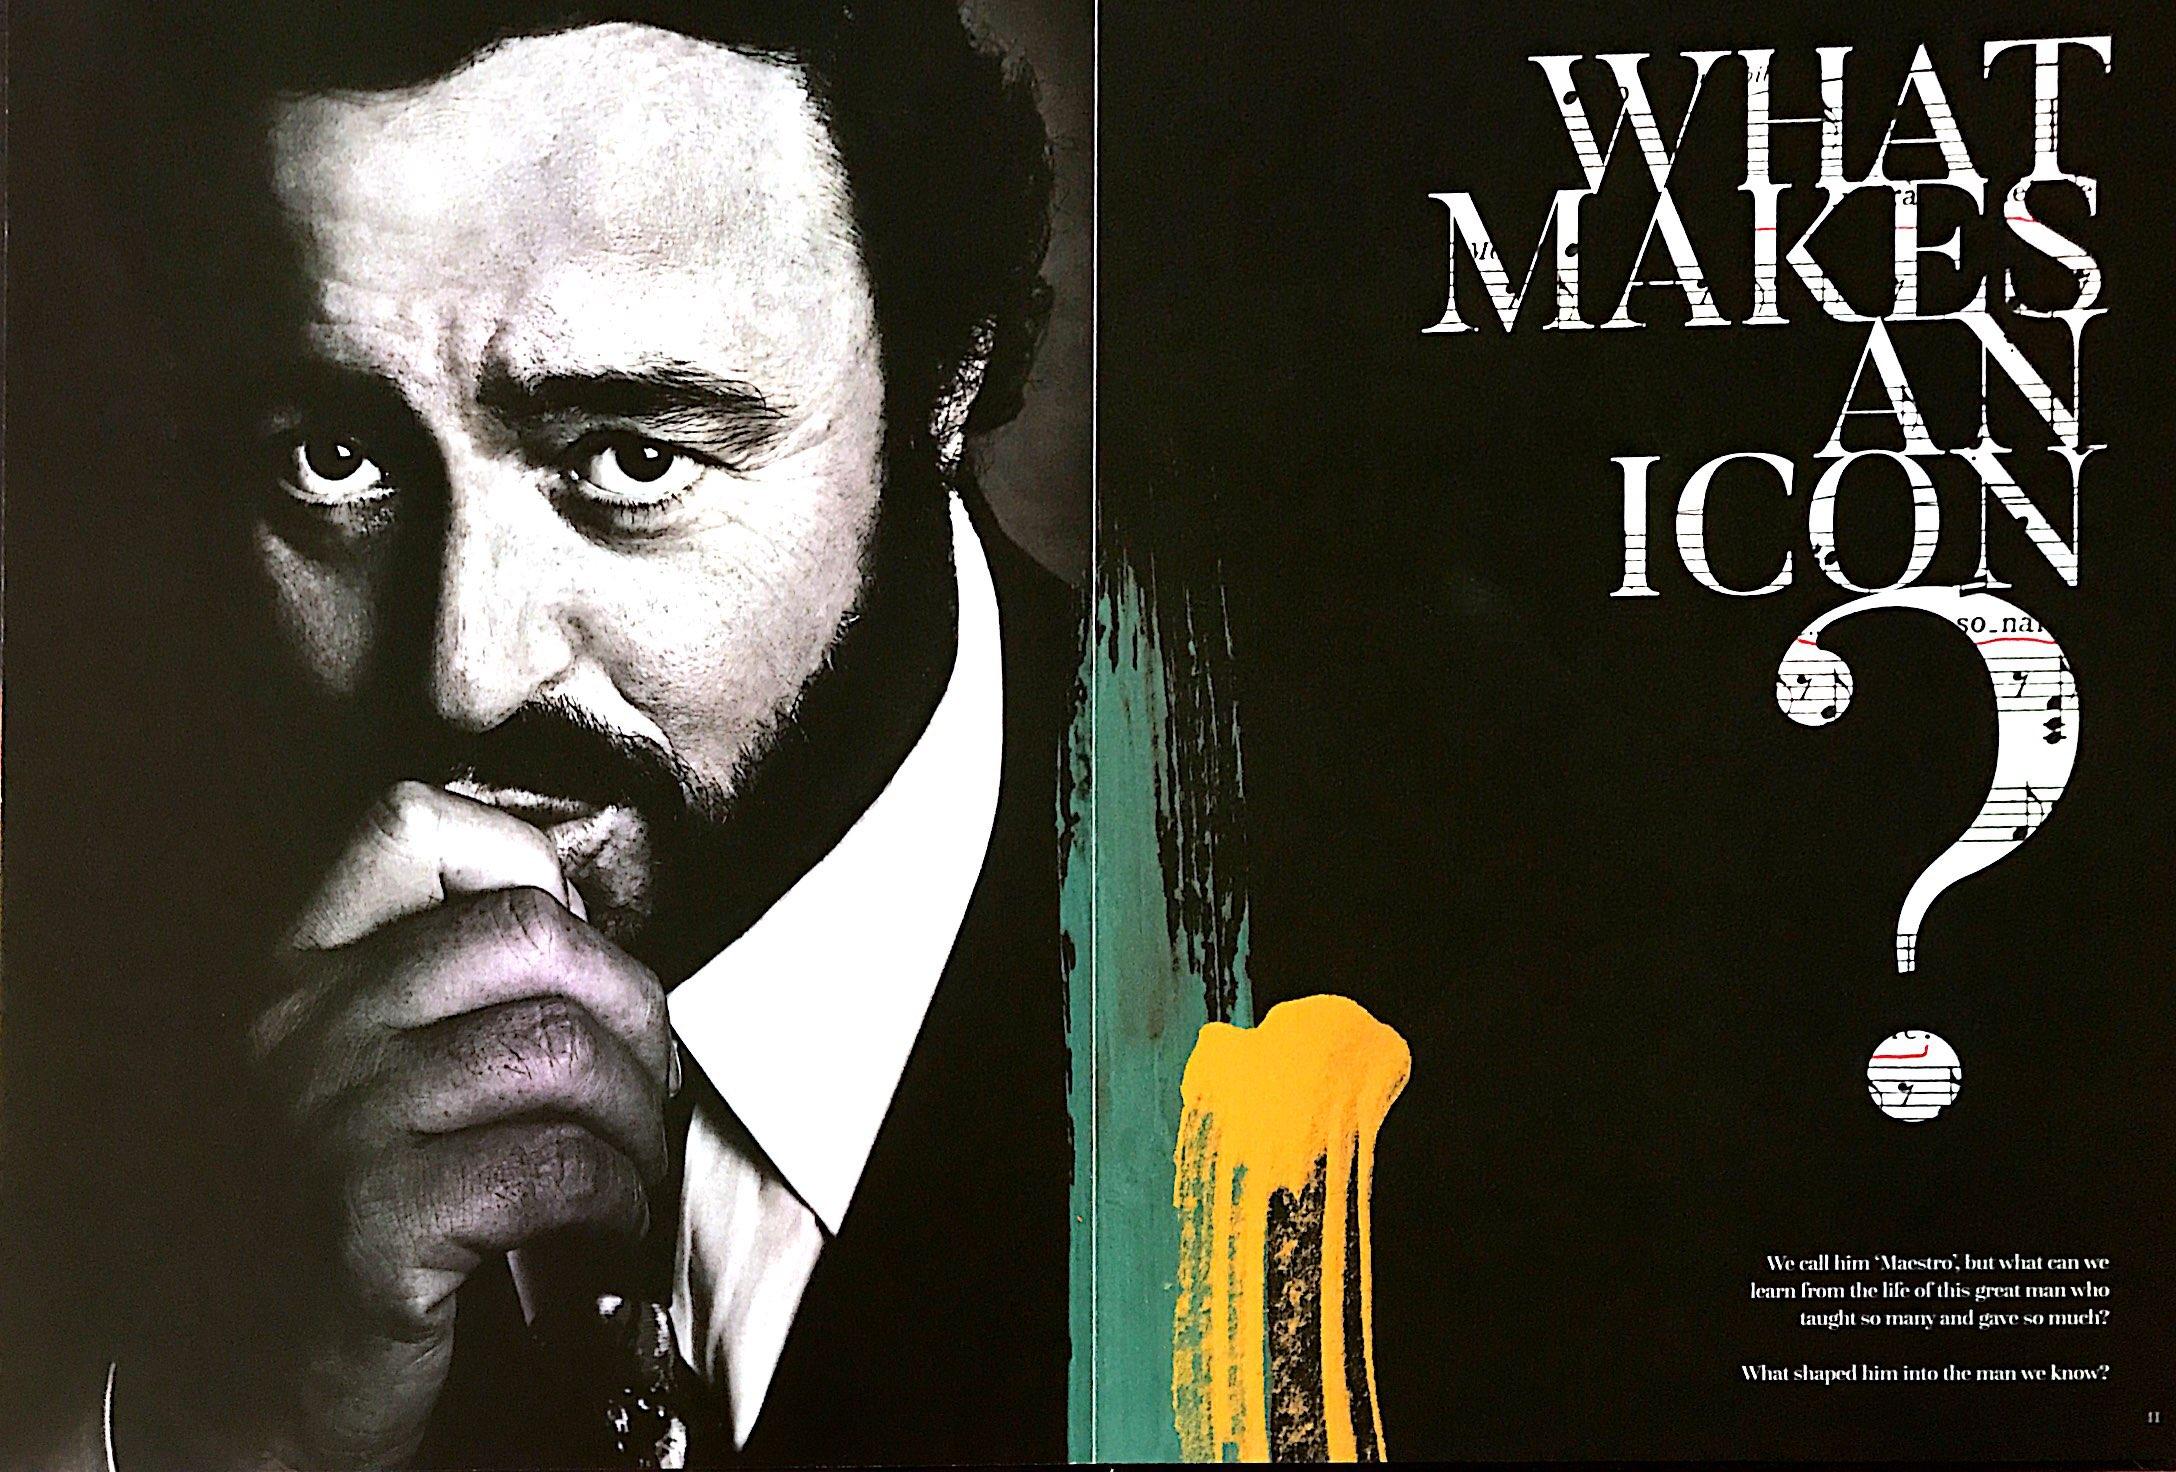 Picture of Luciano Pavarotti, the famous Italian tenor